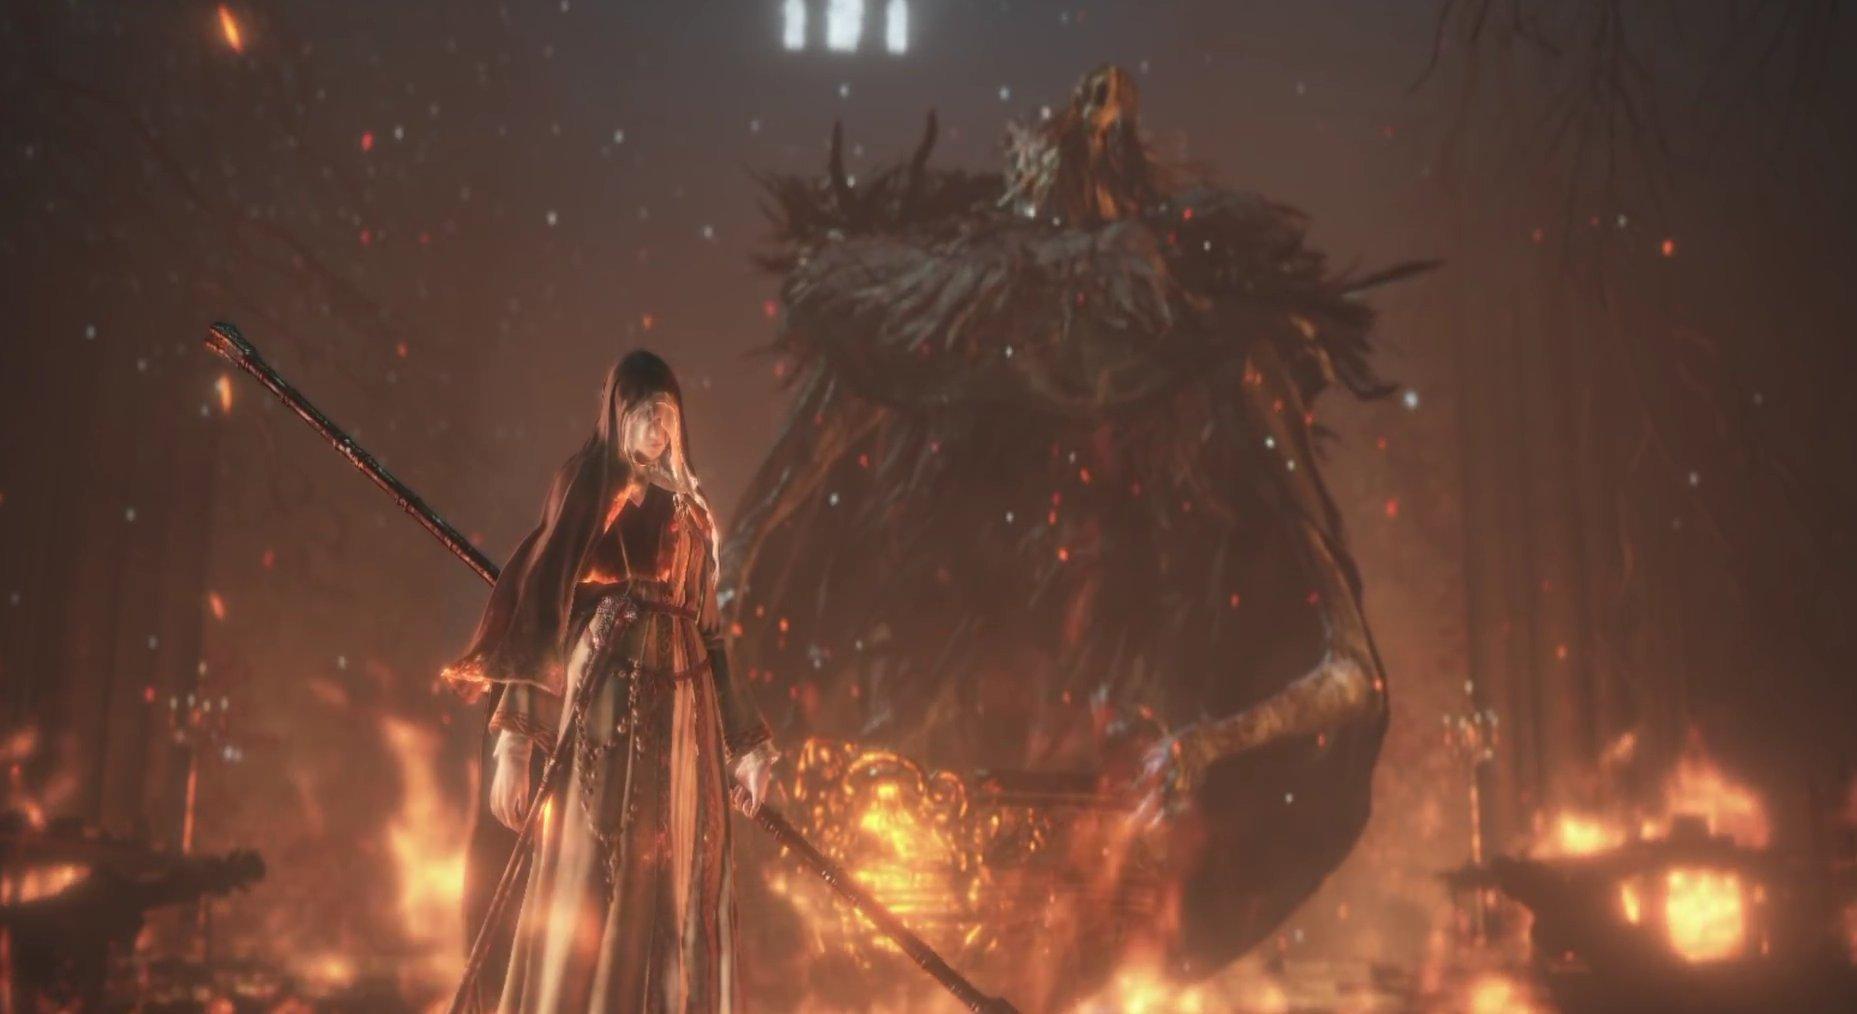 Dark Souls 3 Bosses Ranked Weakest To Strongest Gamers Decide